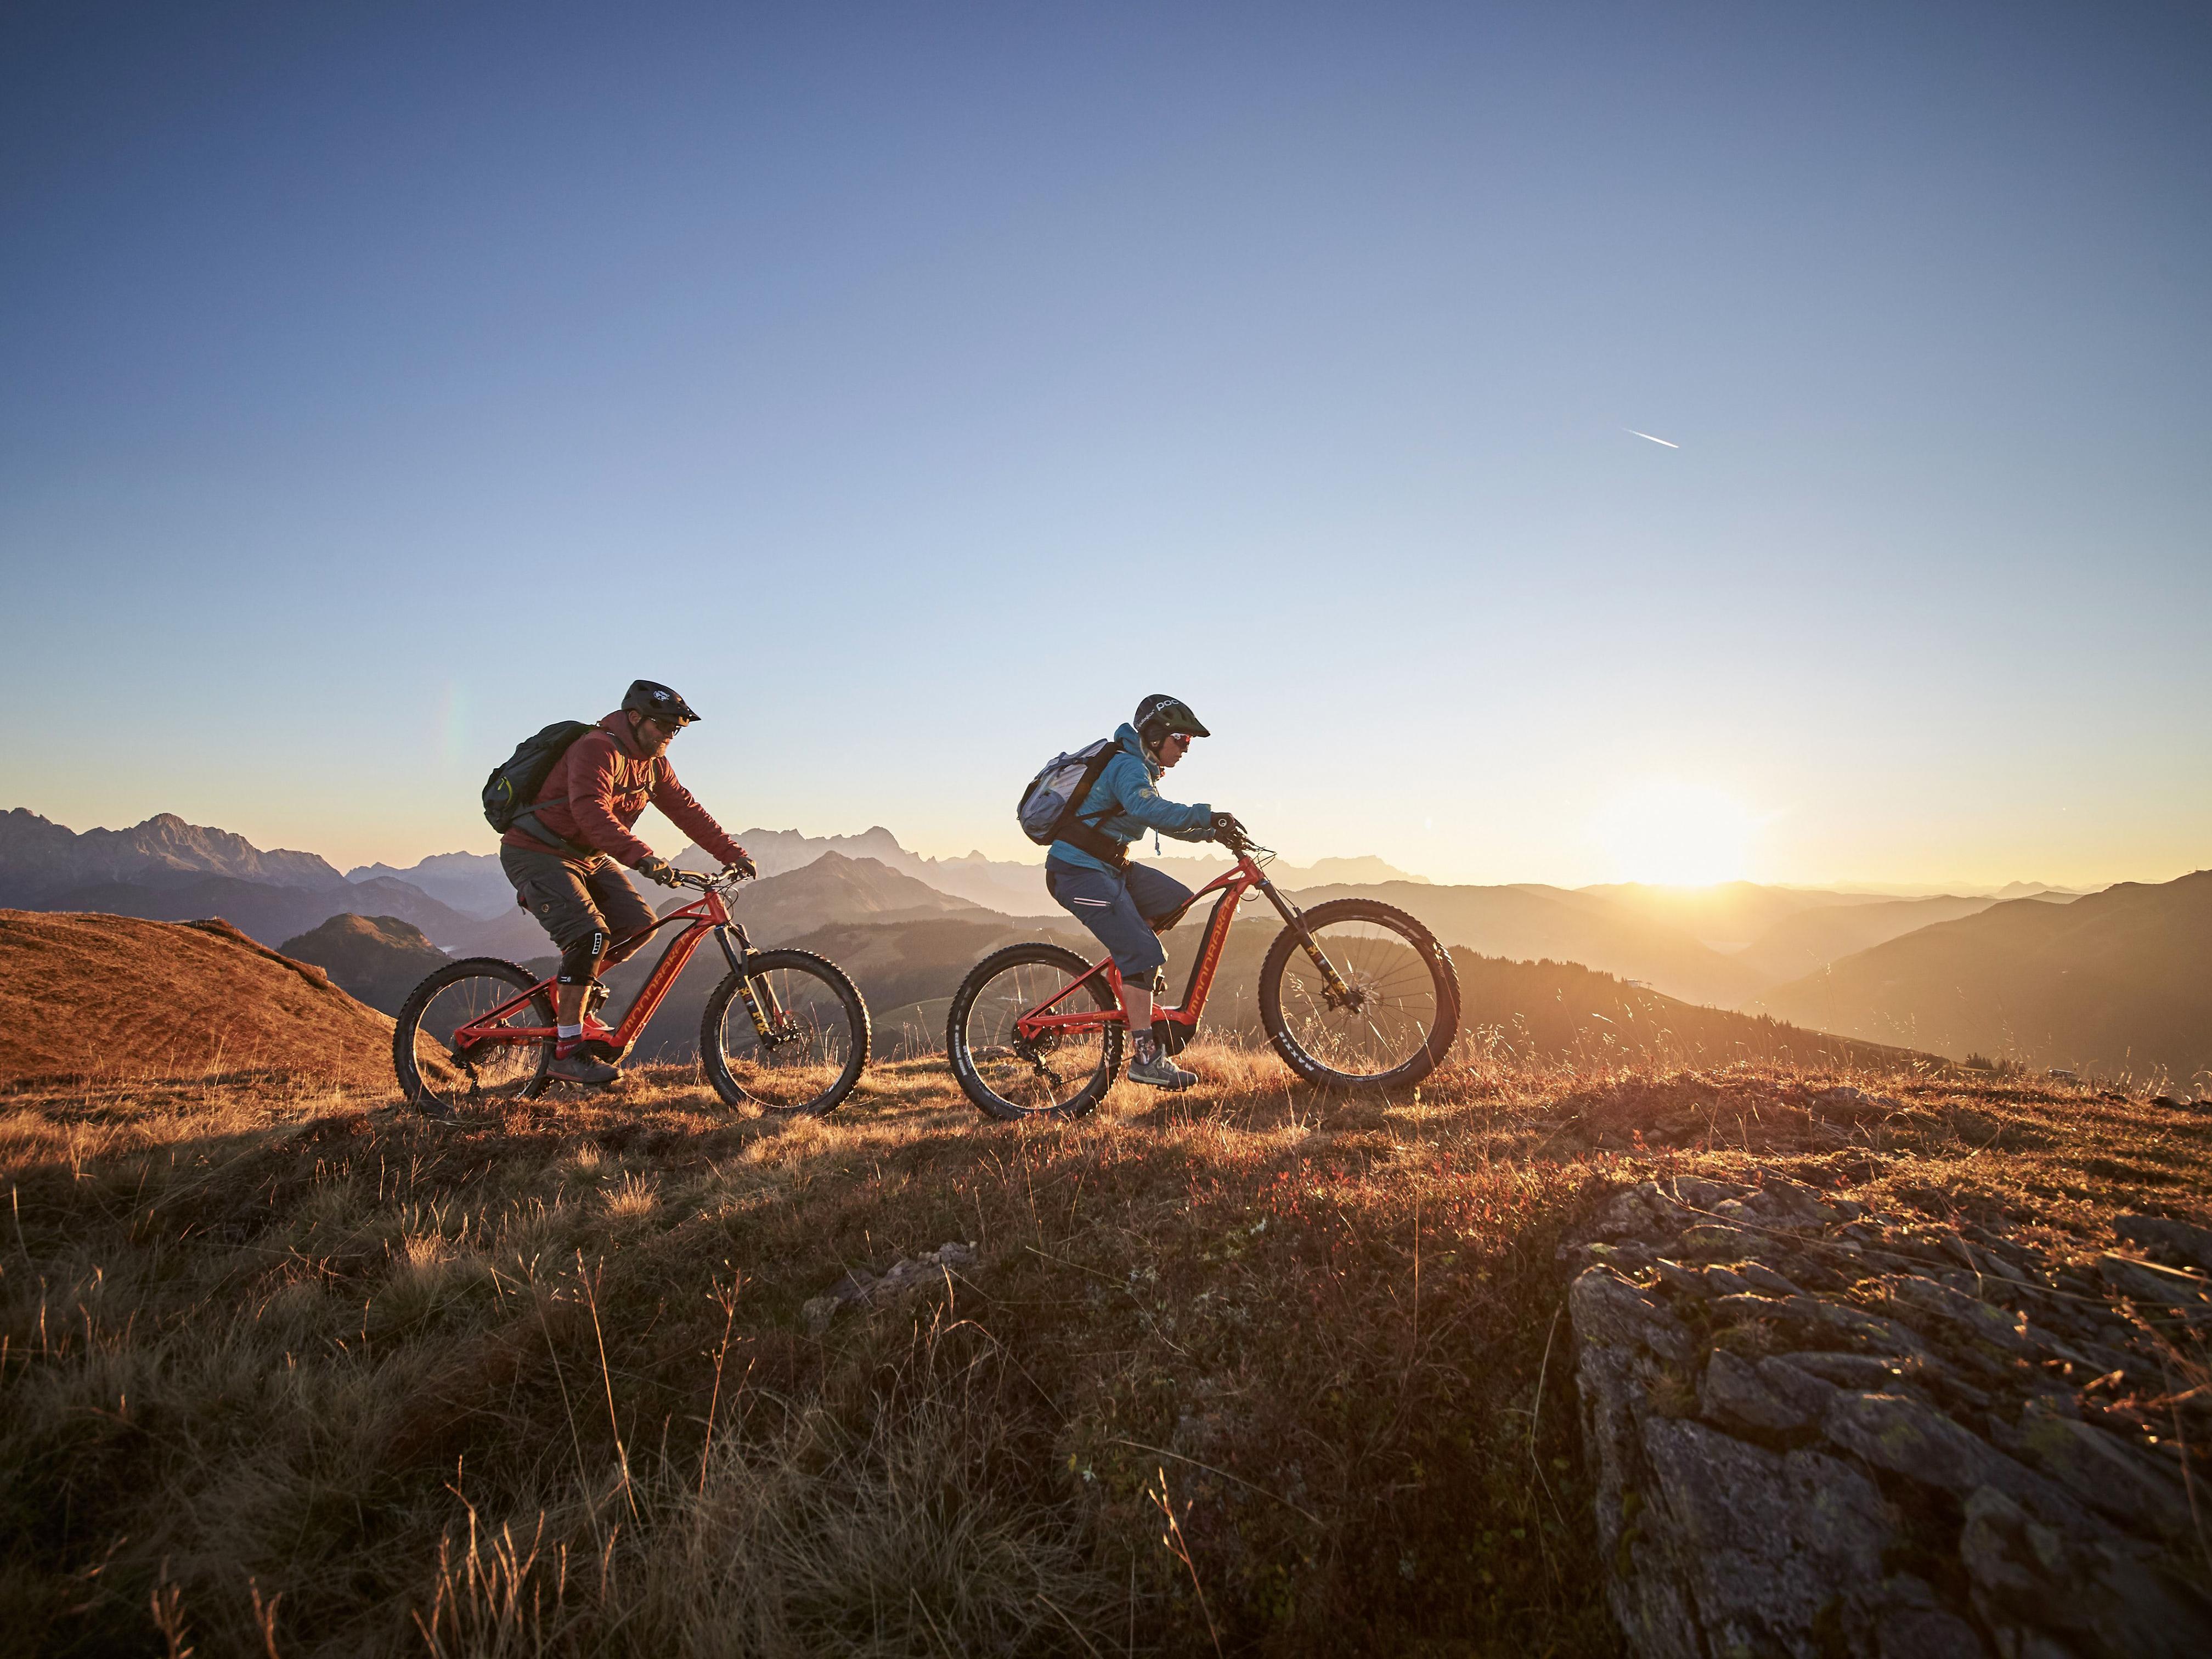 Atemberaubenden Panoramablick über die Bergwelt beim Panoramabiken in Saalbach-Hinterglemm.